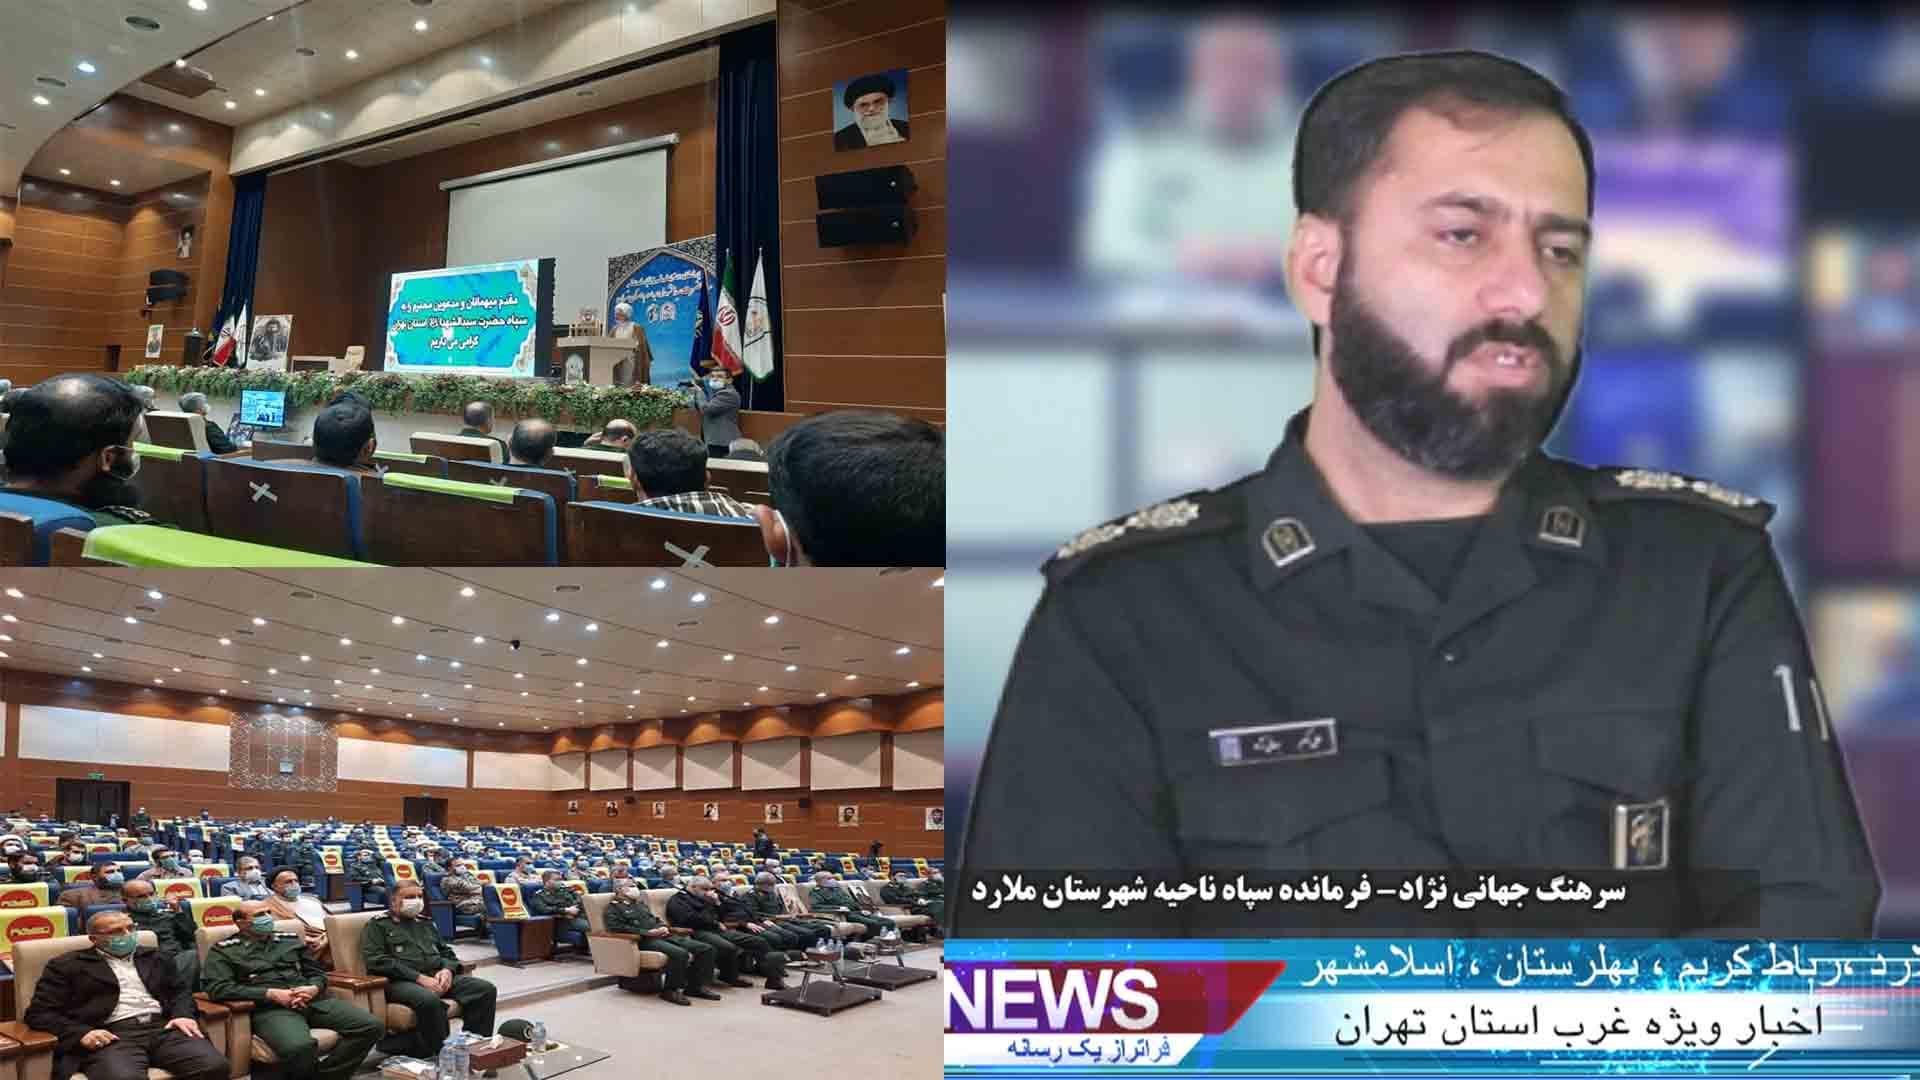 تکریم سردار حسن زاده – گفتگوی سرهنگ جهانی نژاد مشروح خبر 2آذر